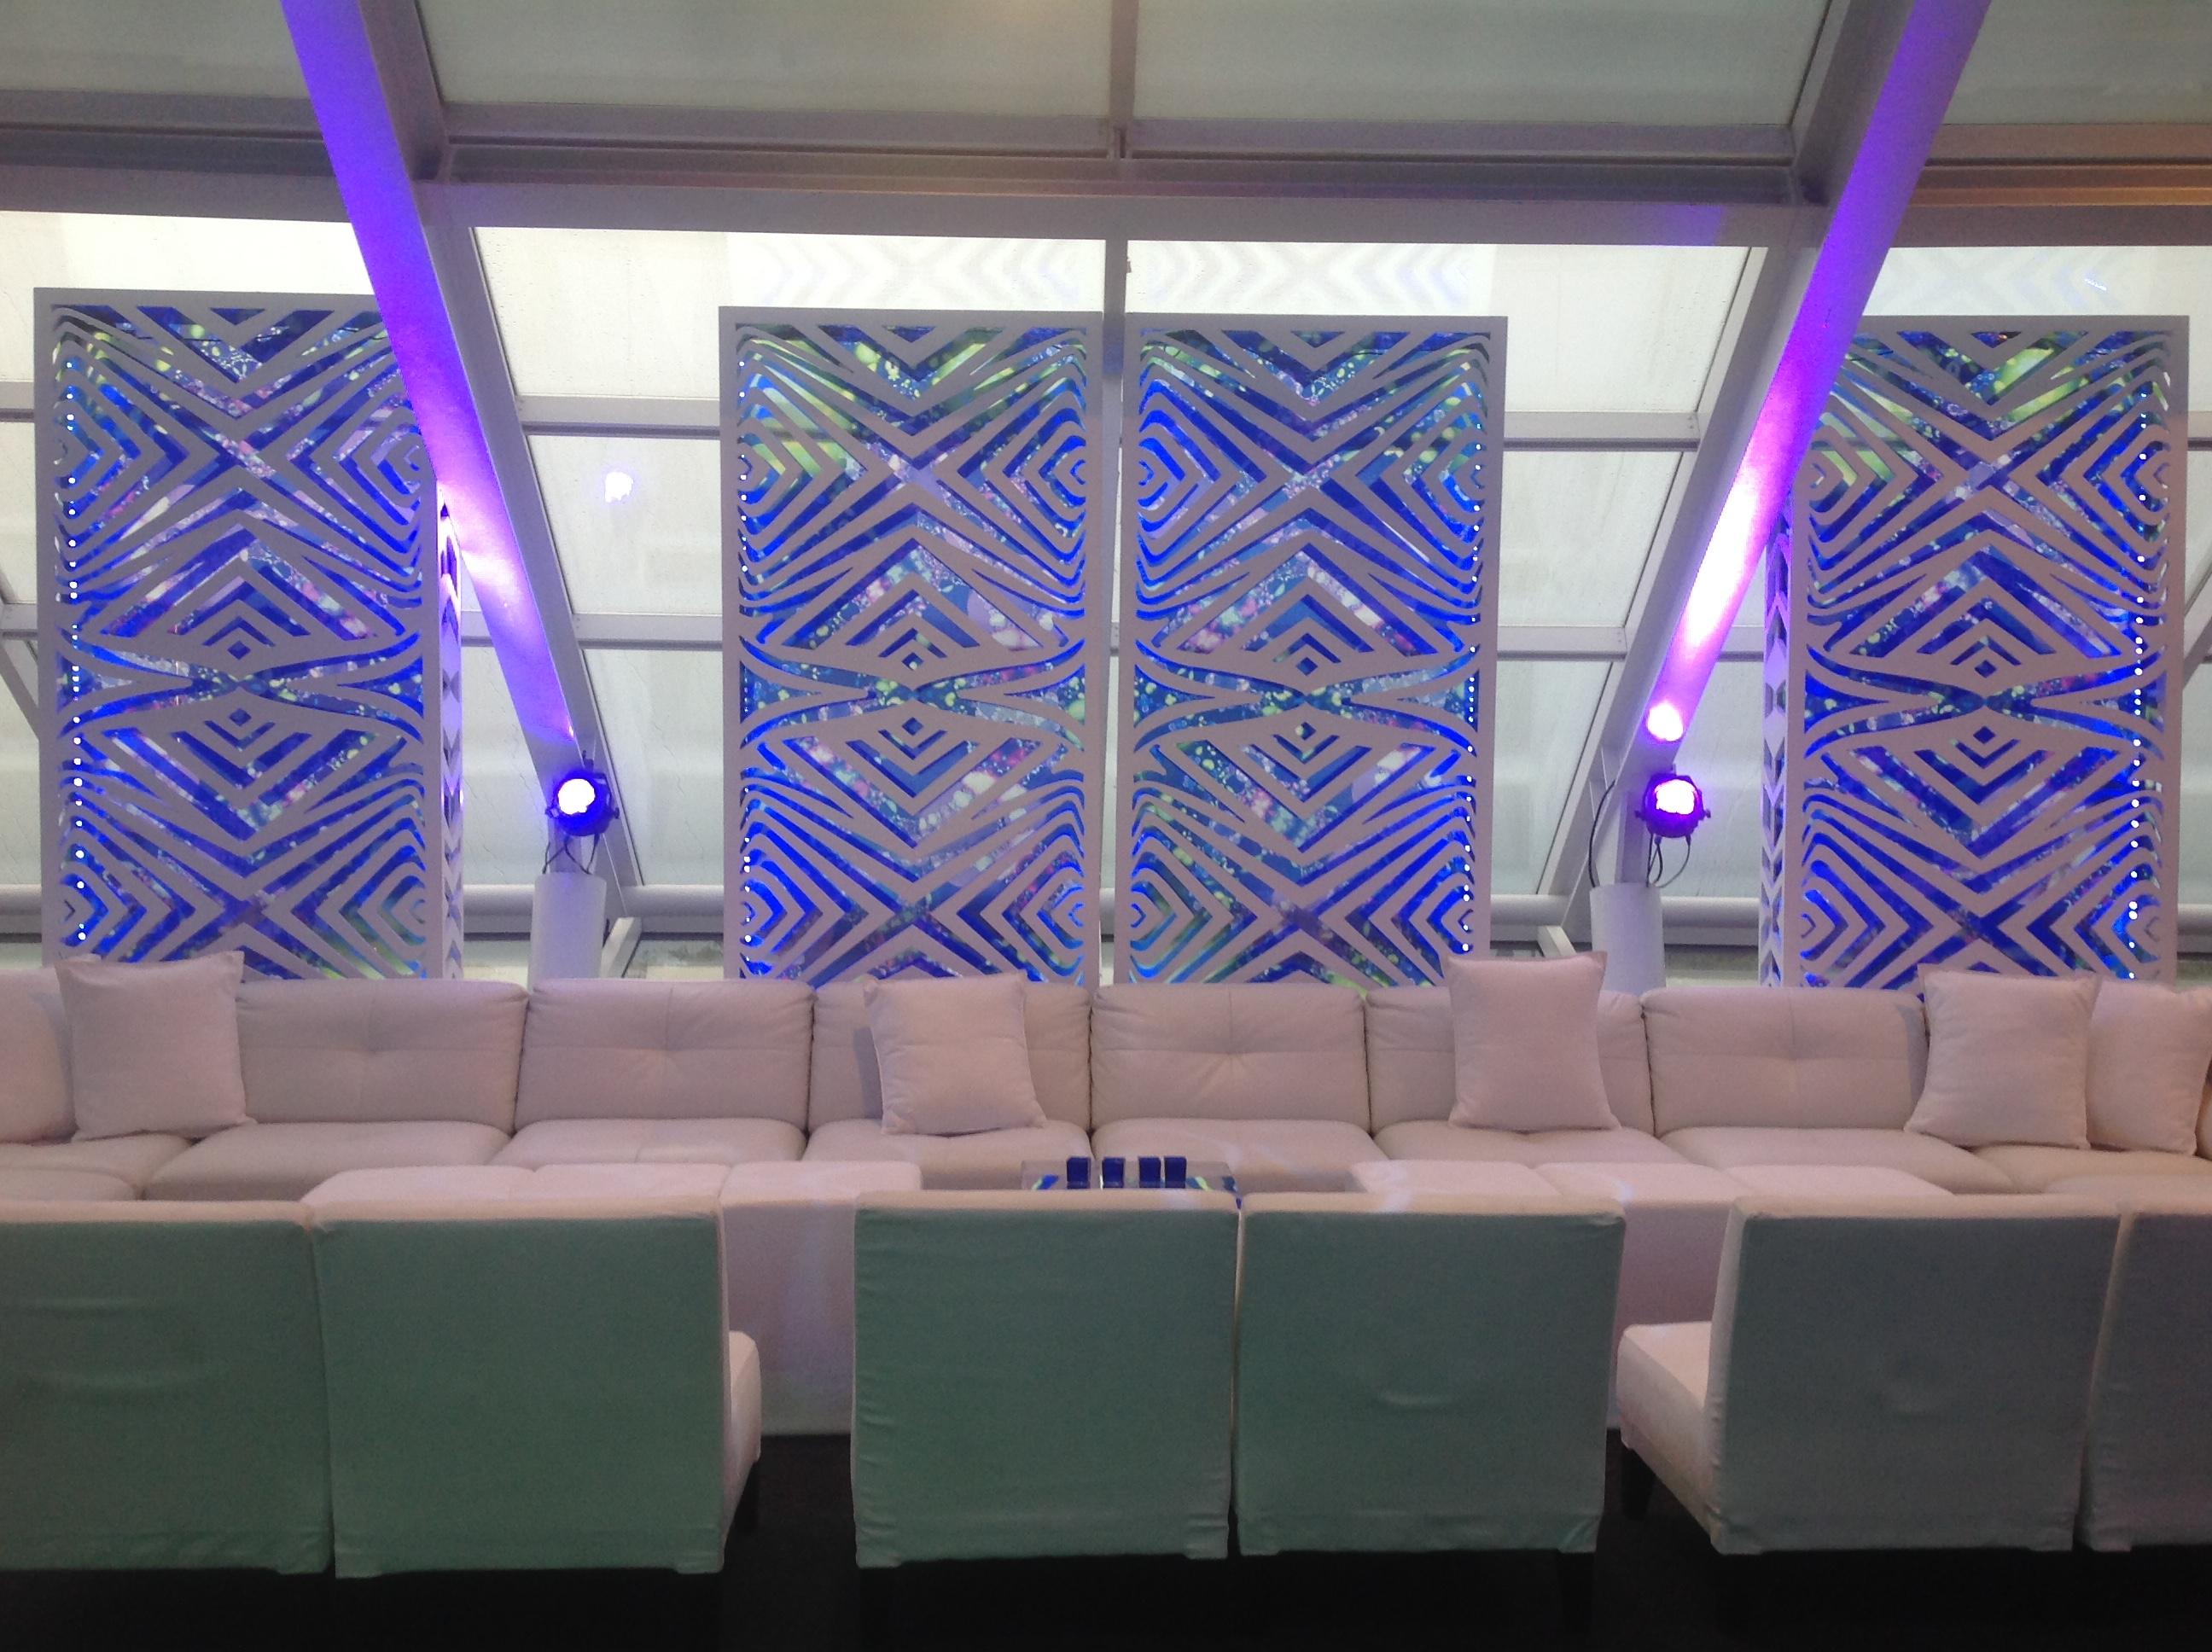 Adler Planetarium Corporate Event - Joyce Pollakoff Events